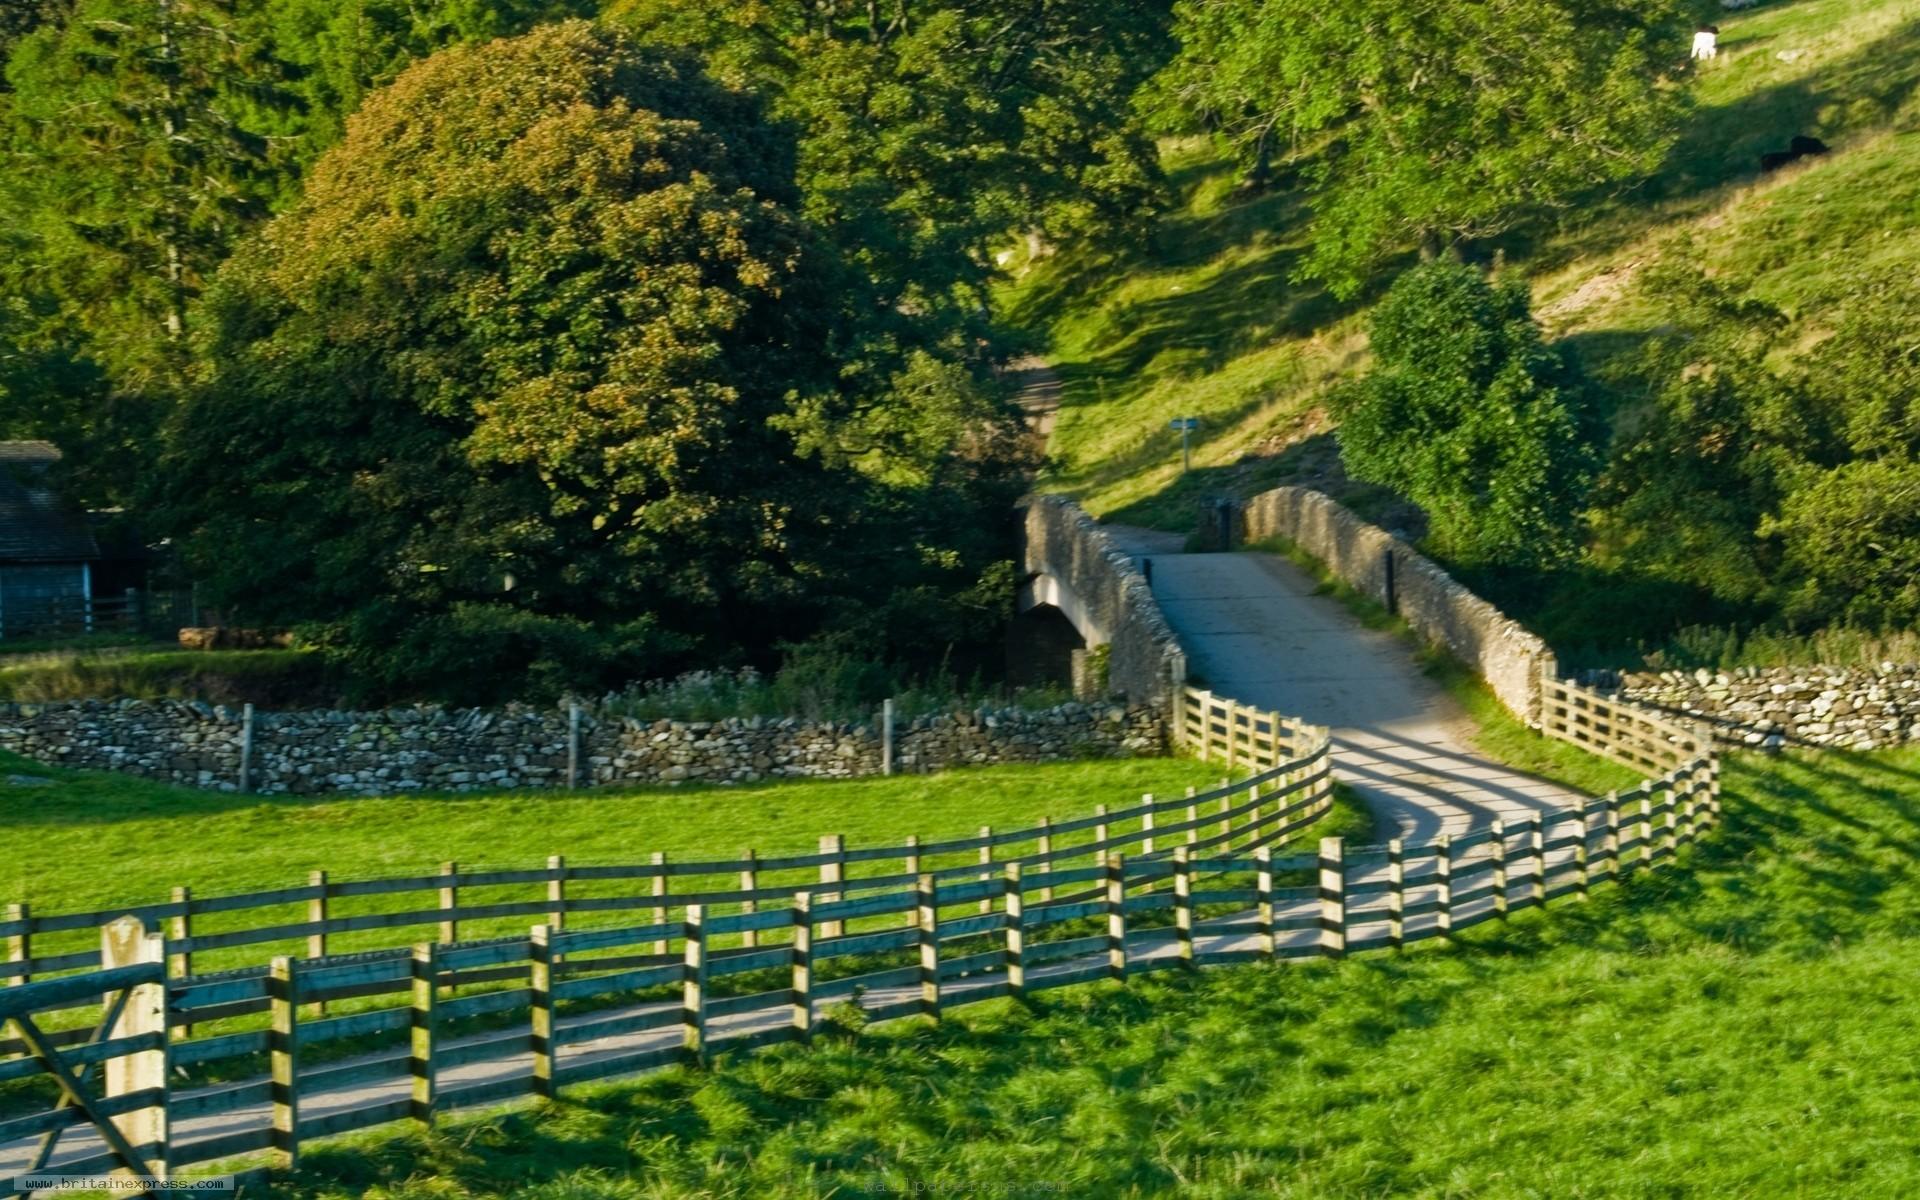 Scenic Roads Wallpaper | scenic, wallpaper, desktop, Landscape wallpapers